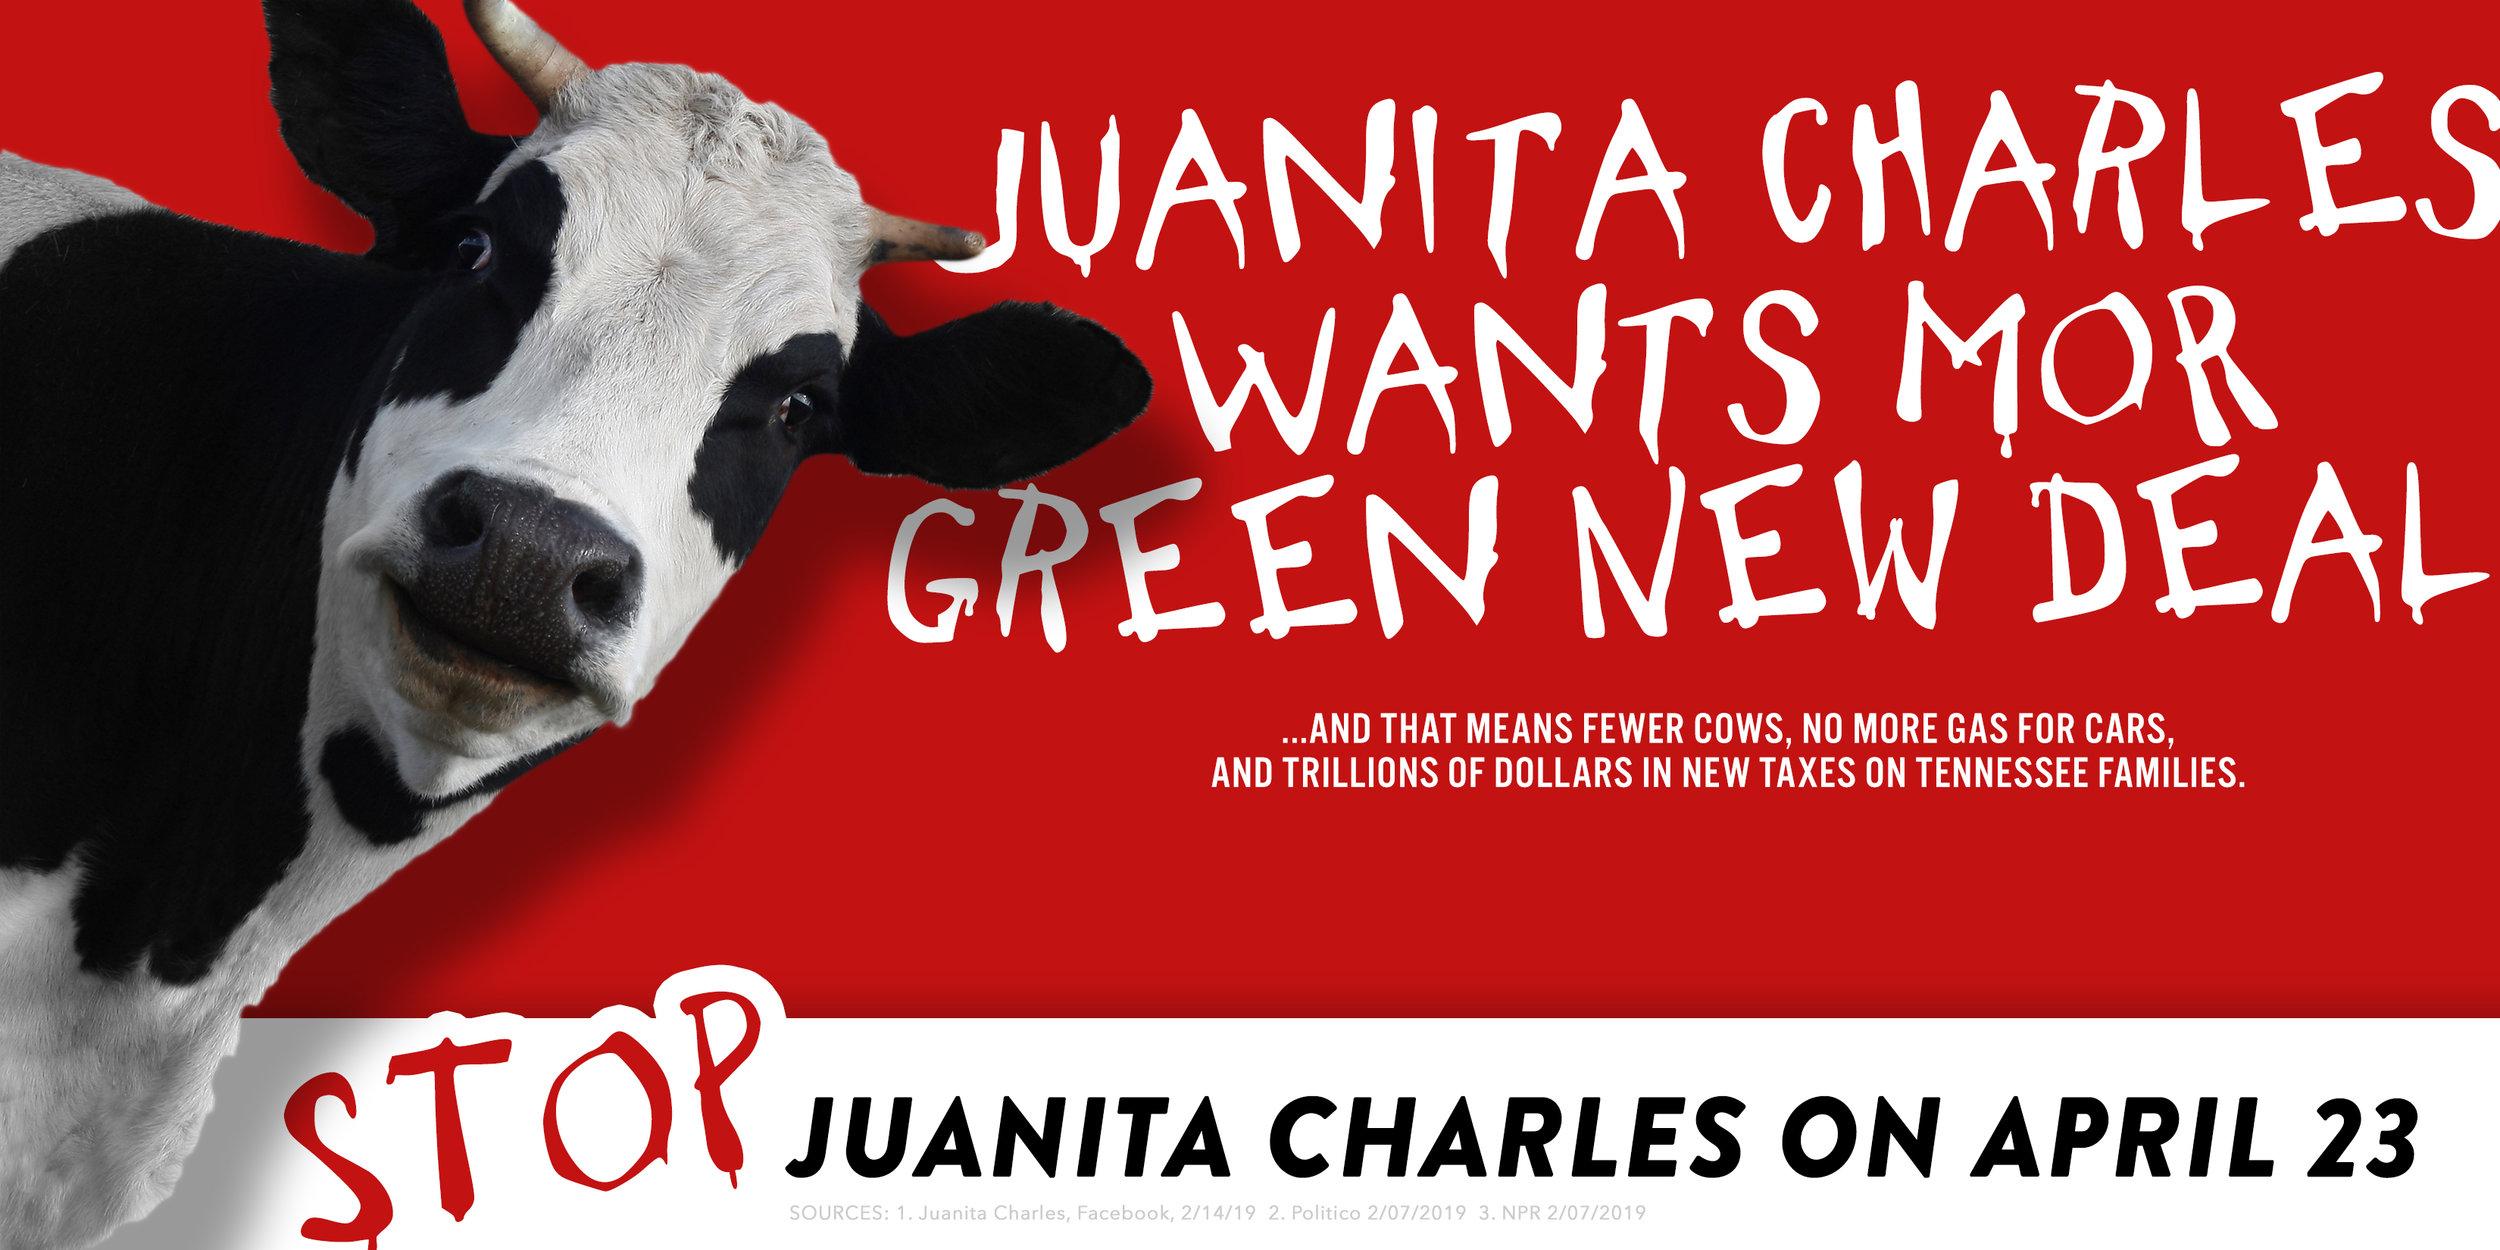 Direct-Edge-Portfolio-STOP-JUANITA-CHARLES-GREEN-NEW-DEAL_Page_1.jpg